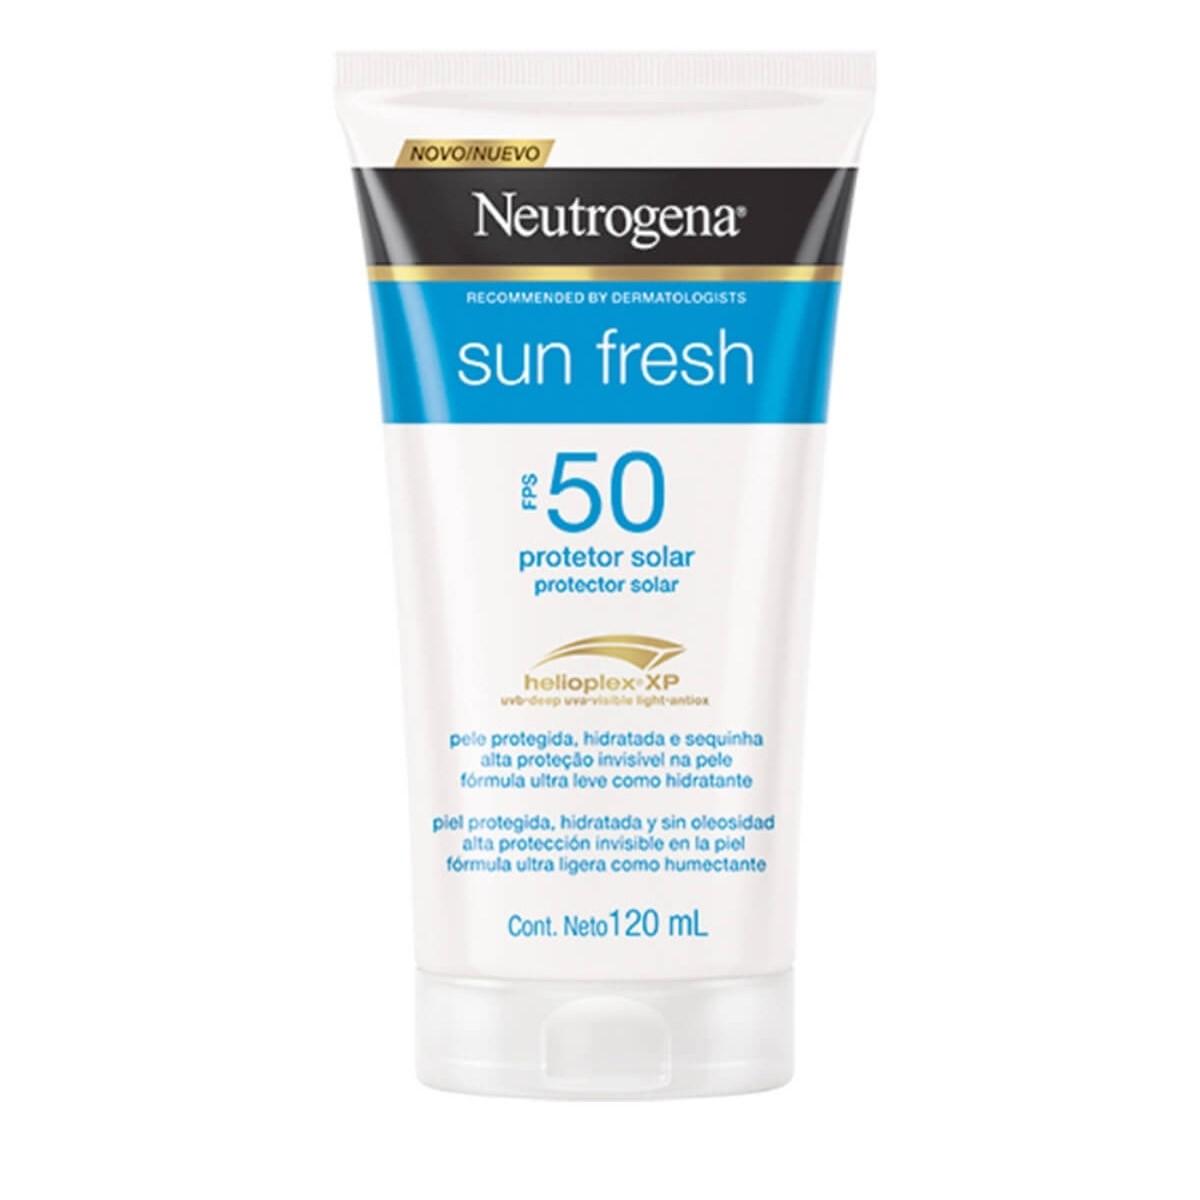 Protetor Solar Neutrogena Sun Fresh FPS50 com 120mL